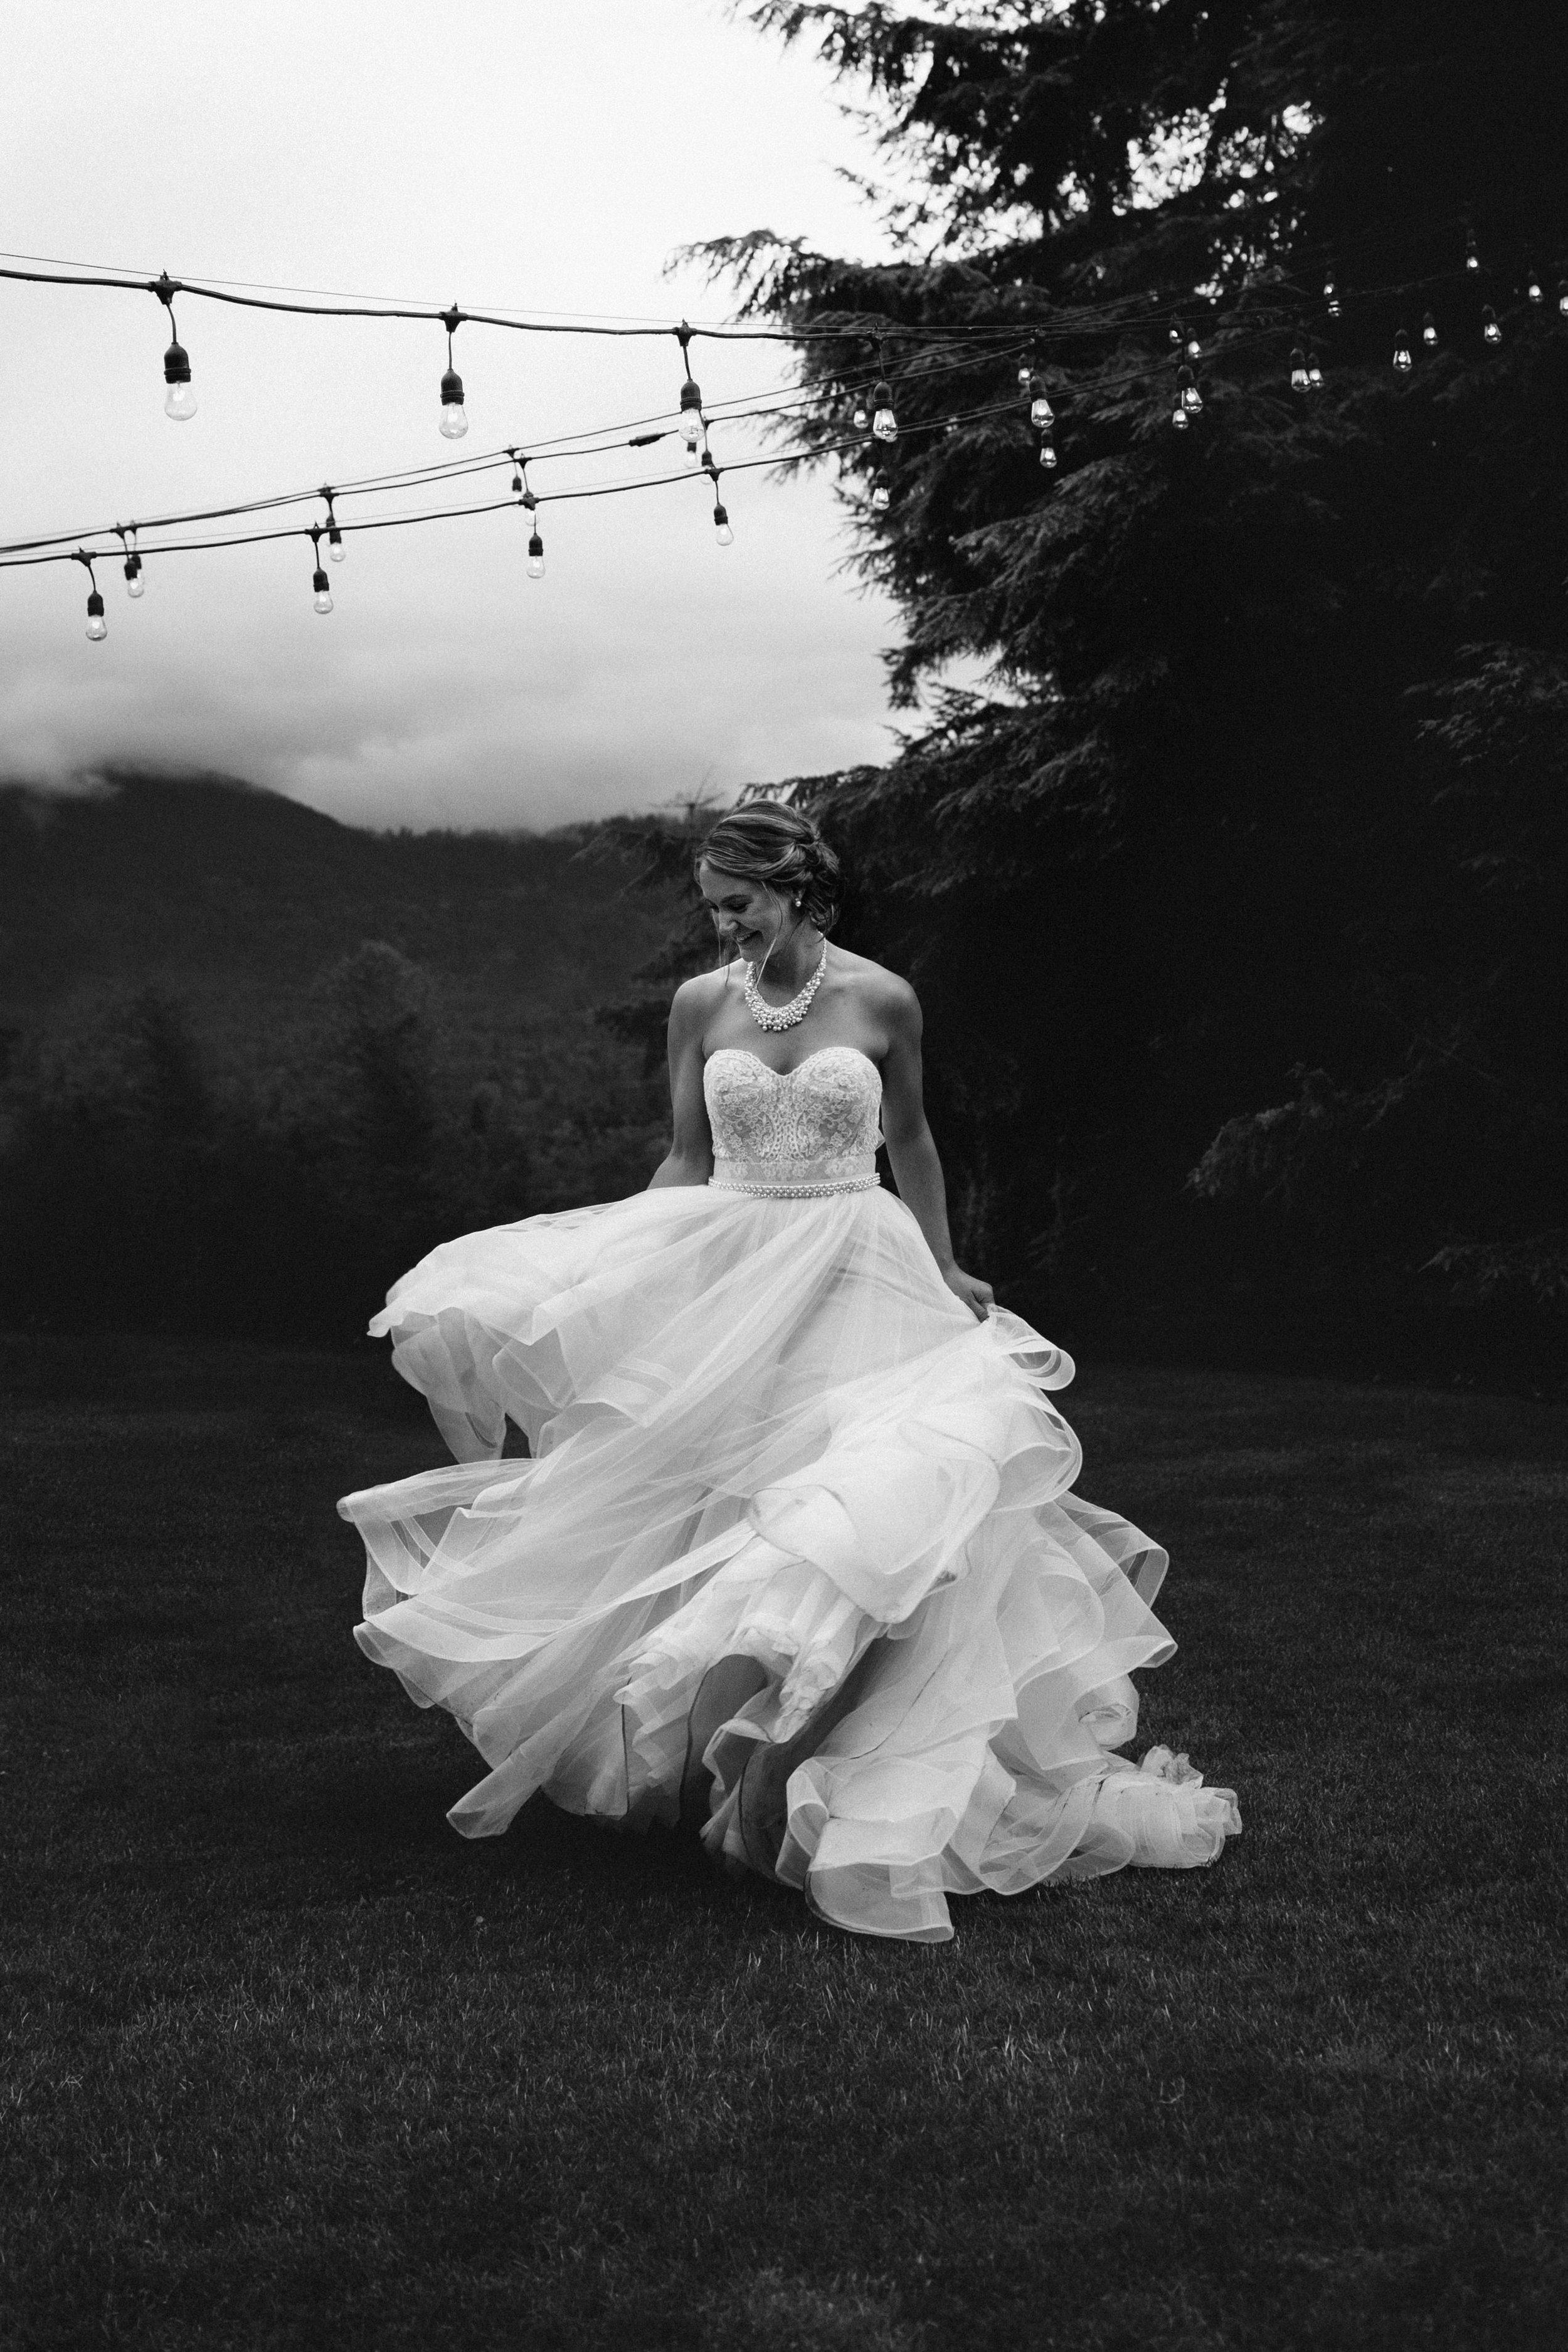 ginapaulson_eriksarah_wedding-1155.jpg